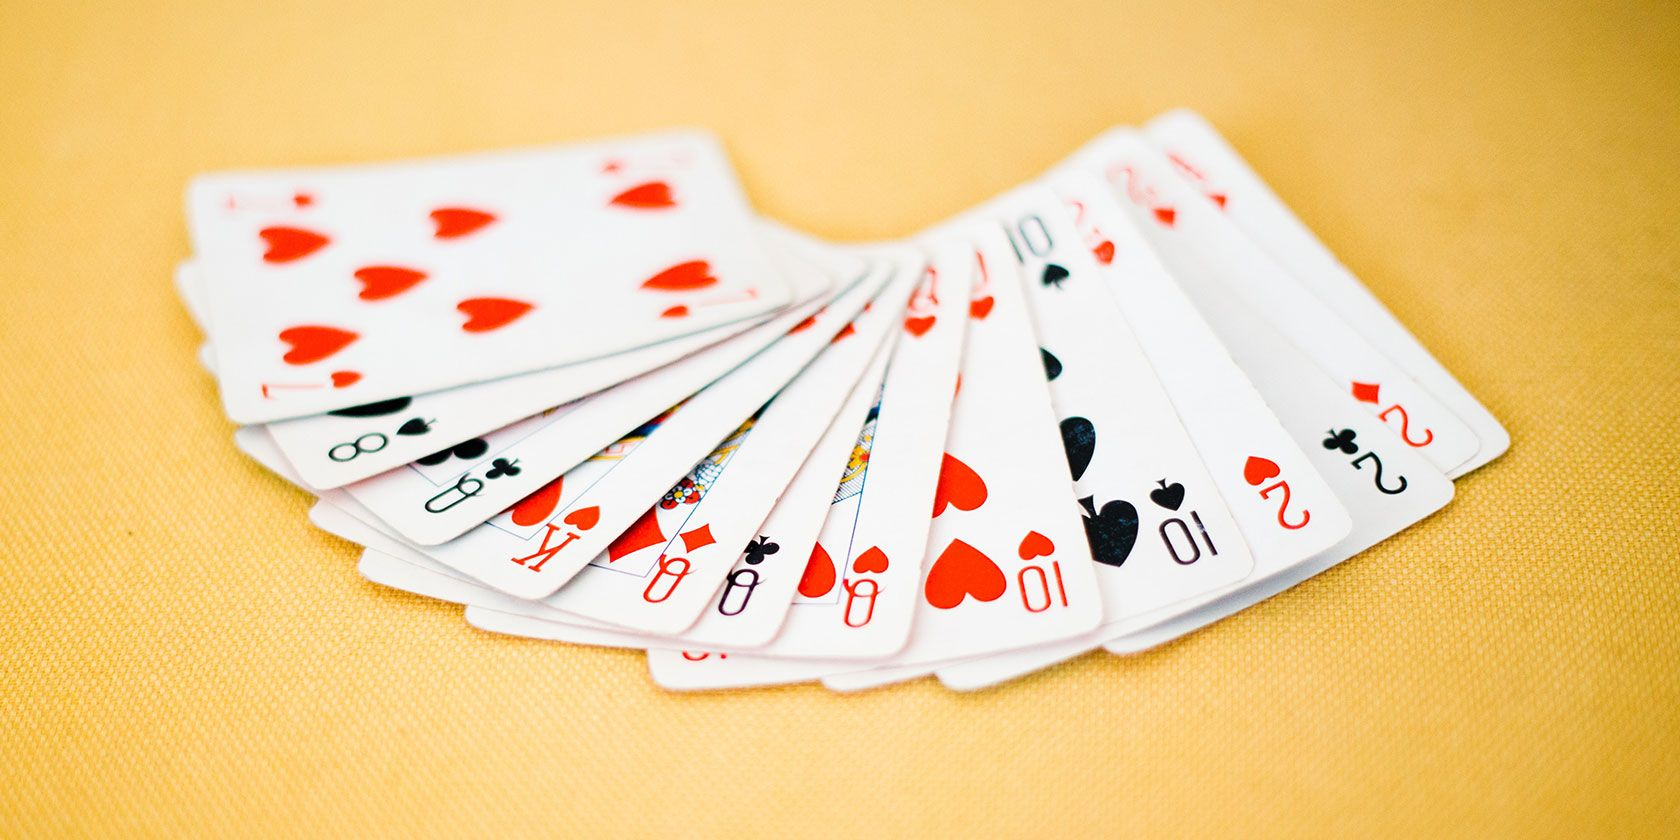 Texas zynga poker free chips facebook